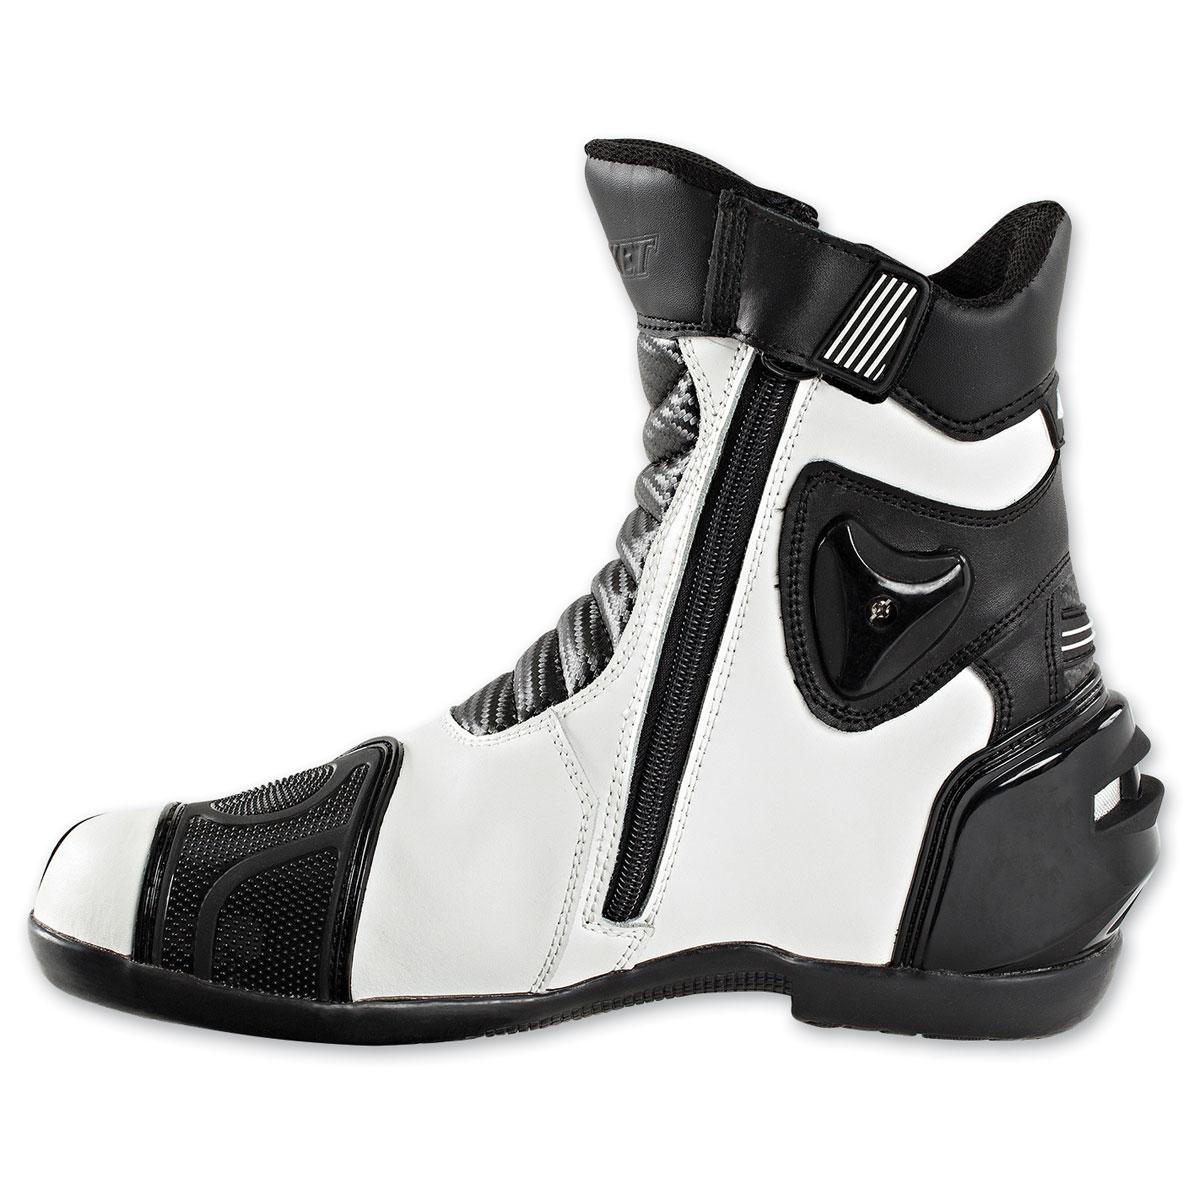 cc3bb0caa0b Joe Rocket Men's Super Street White Boots - 1704-2011